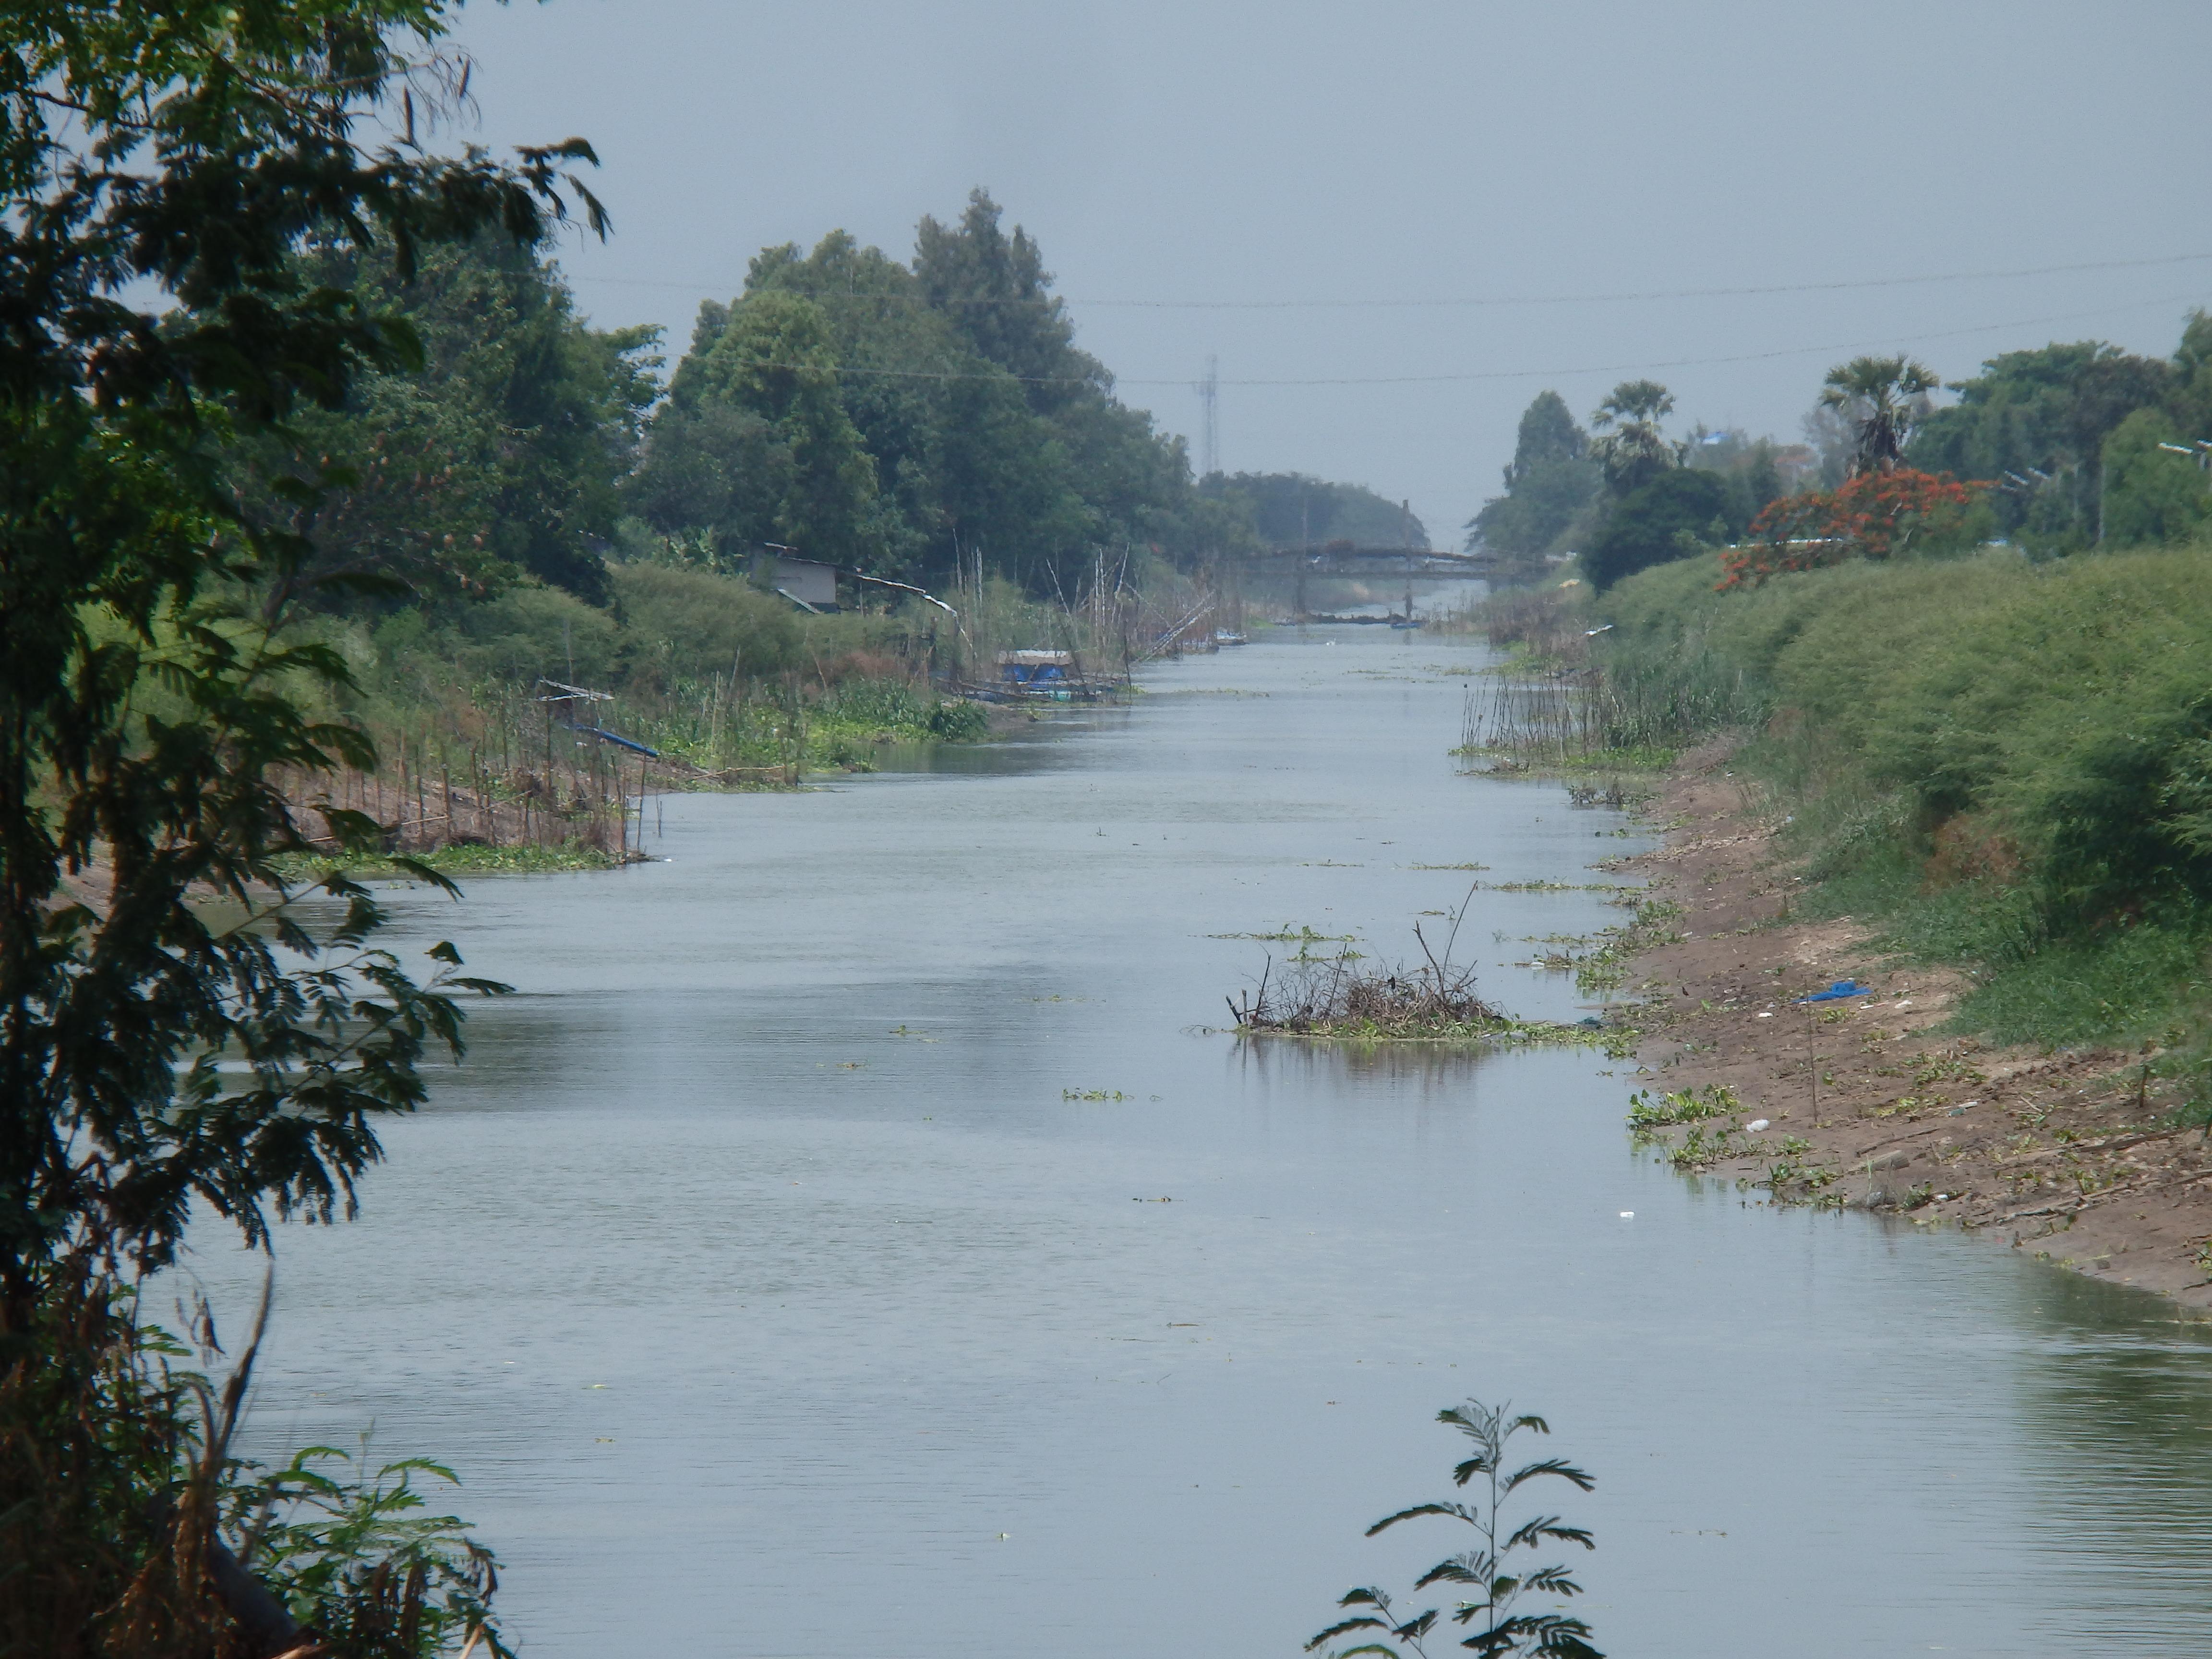 File:Nong Rong Nong Khae District Saraburi Thailand - panoramio (1).jpg - Wikimedia Commons